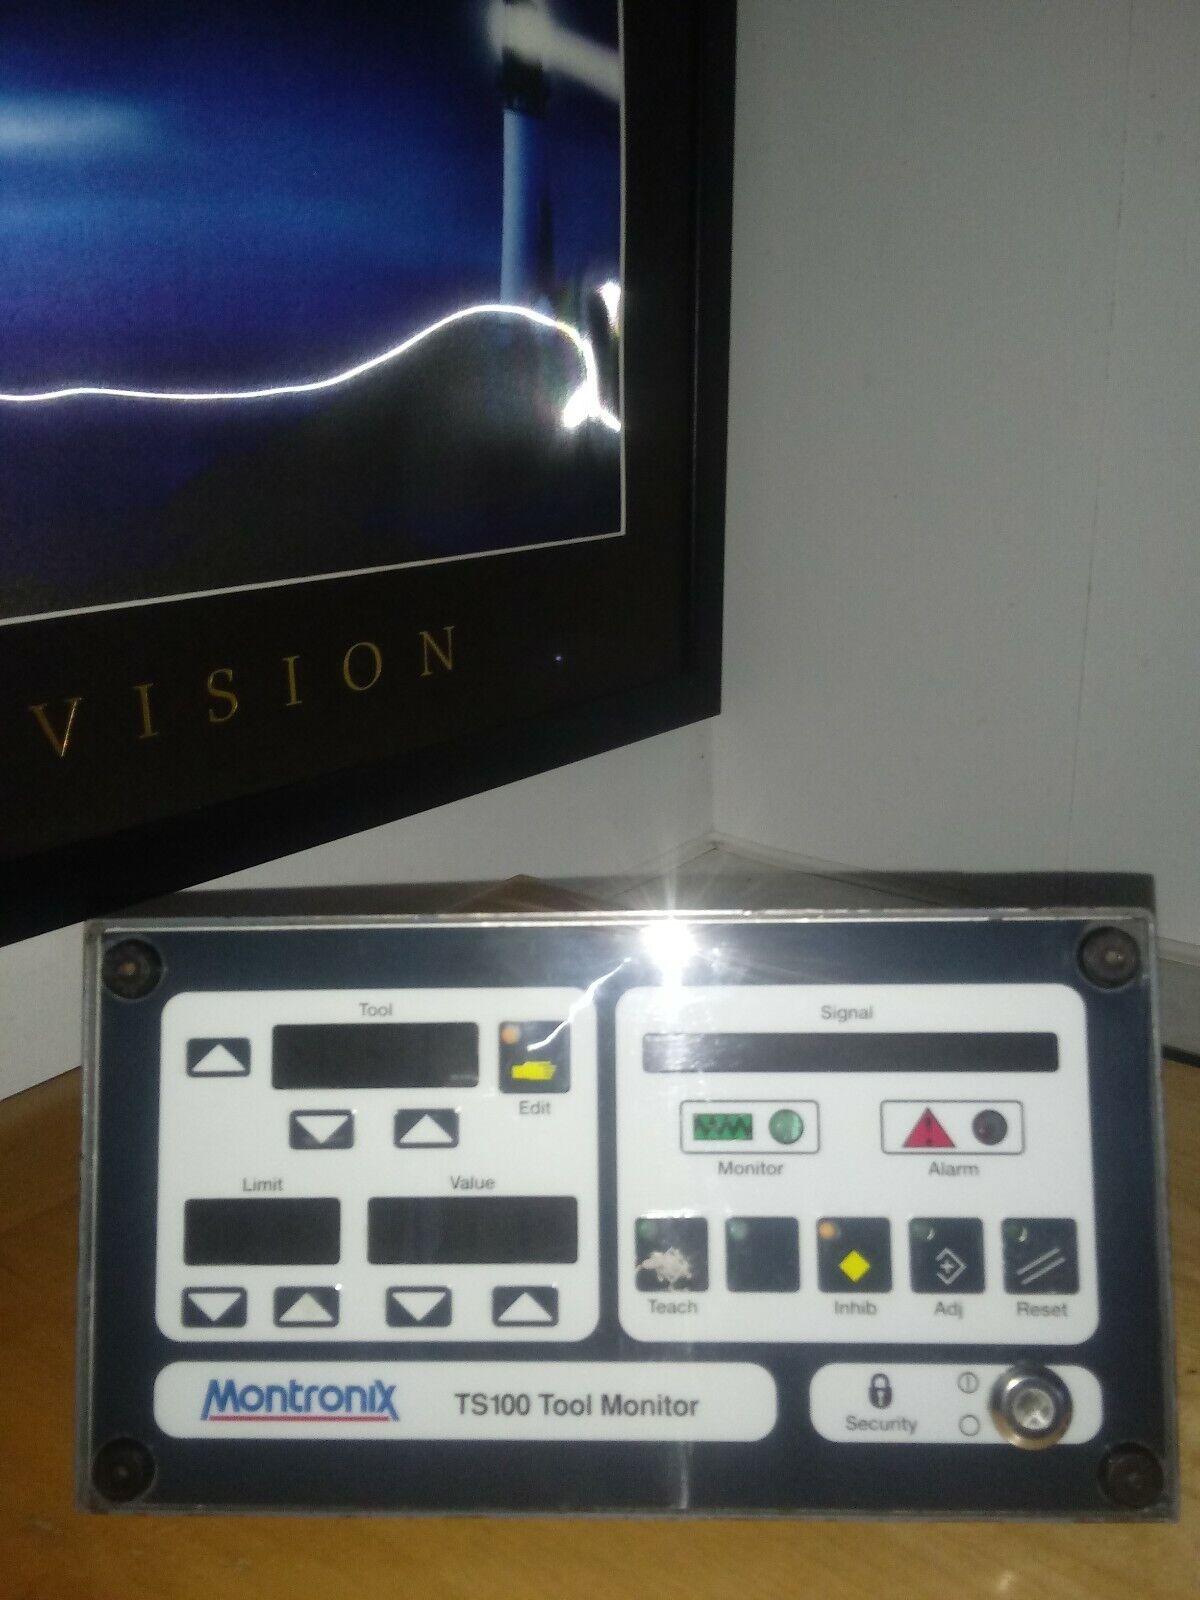 Montronix TS100 Tool Monitor Operator Interface Data Control Keypad Used Working